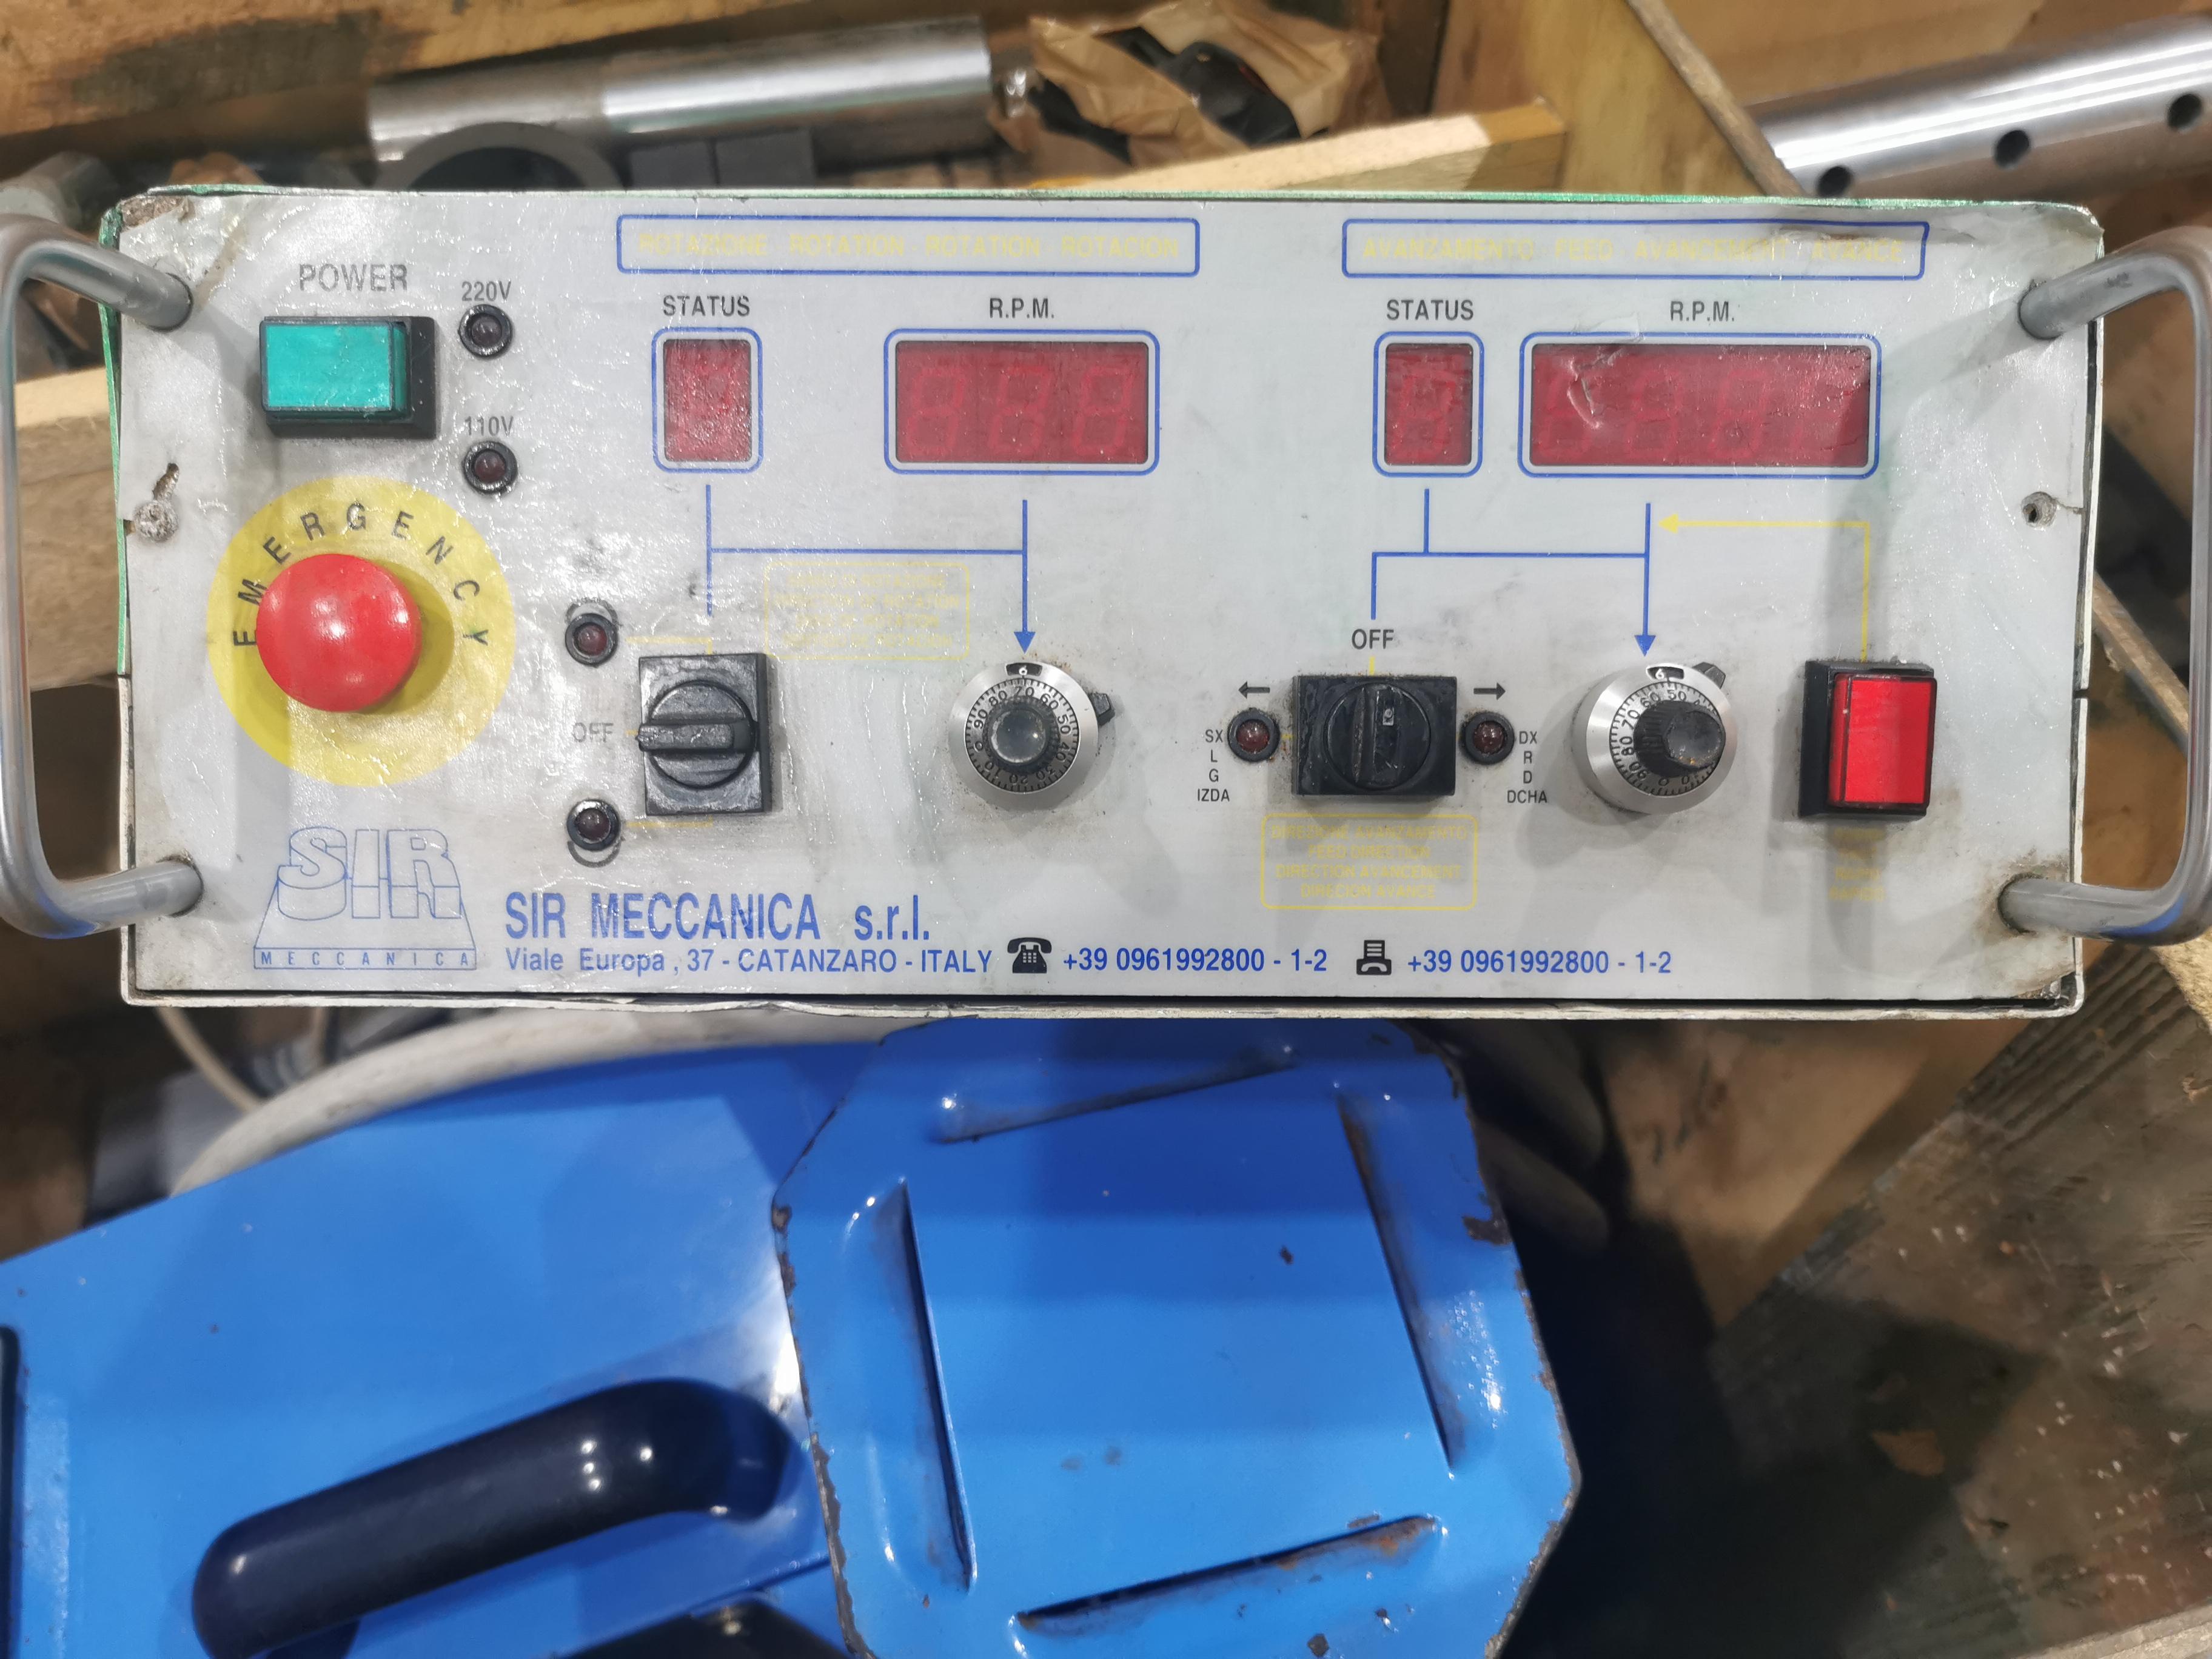 Barenatrice portatile sir meccanica ws3 in vendita - foto 2